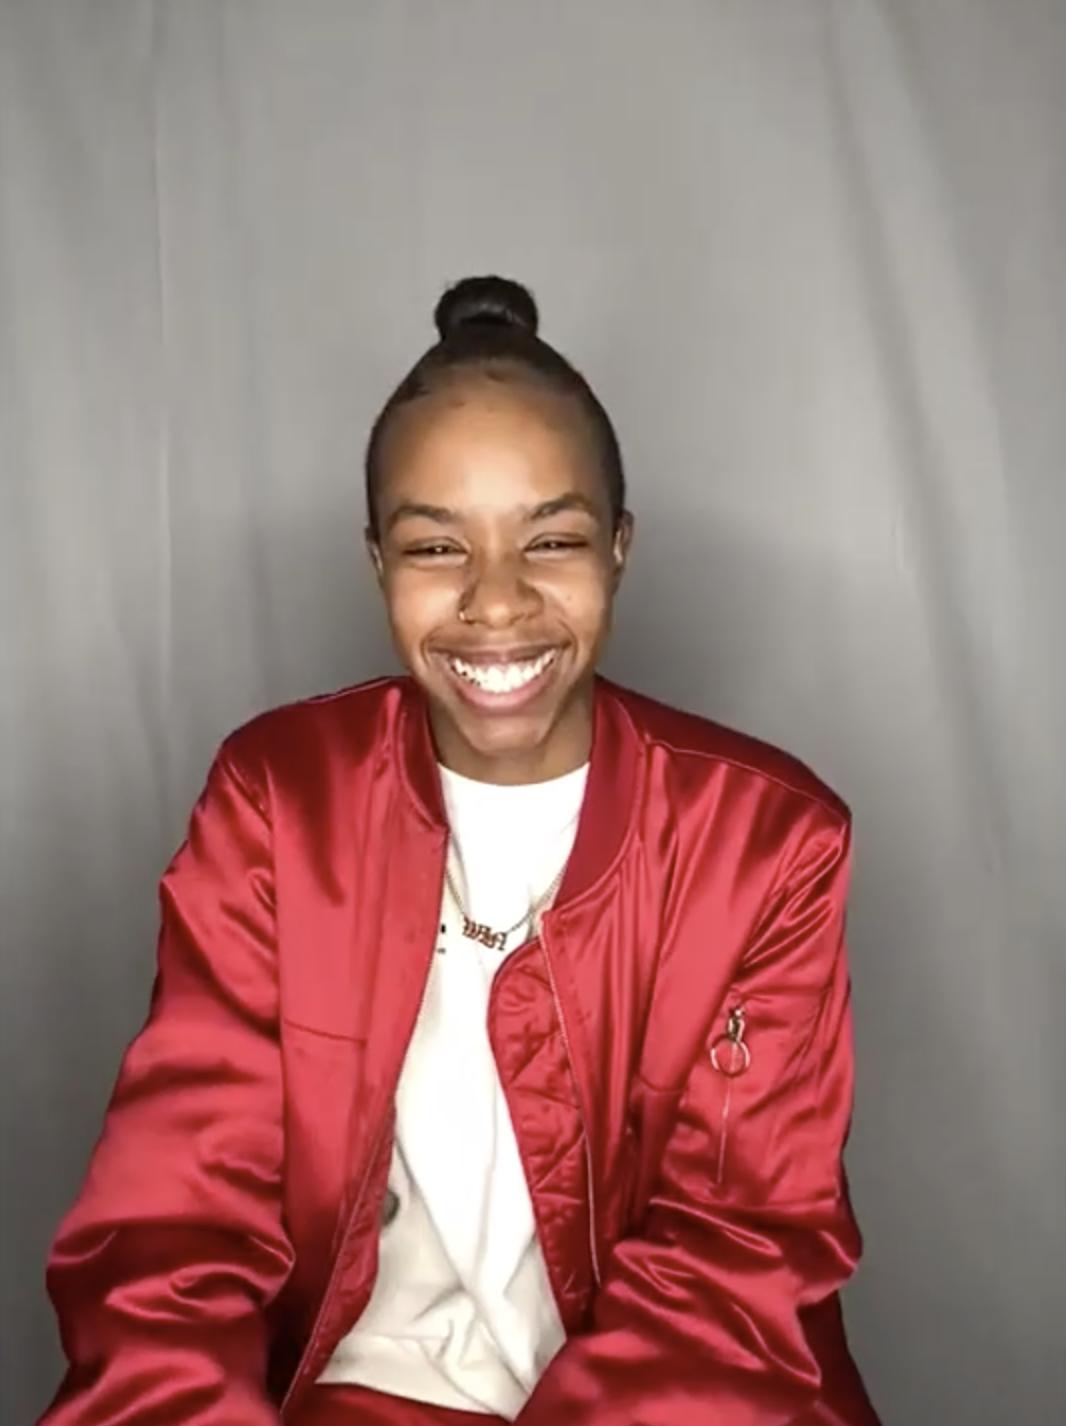 Angel smiling